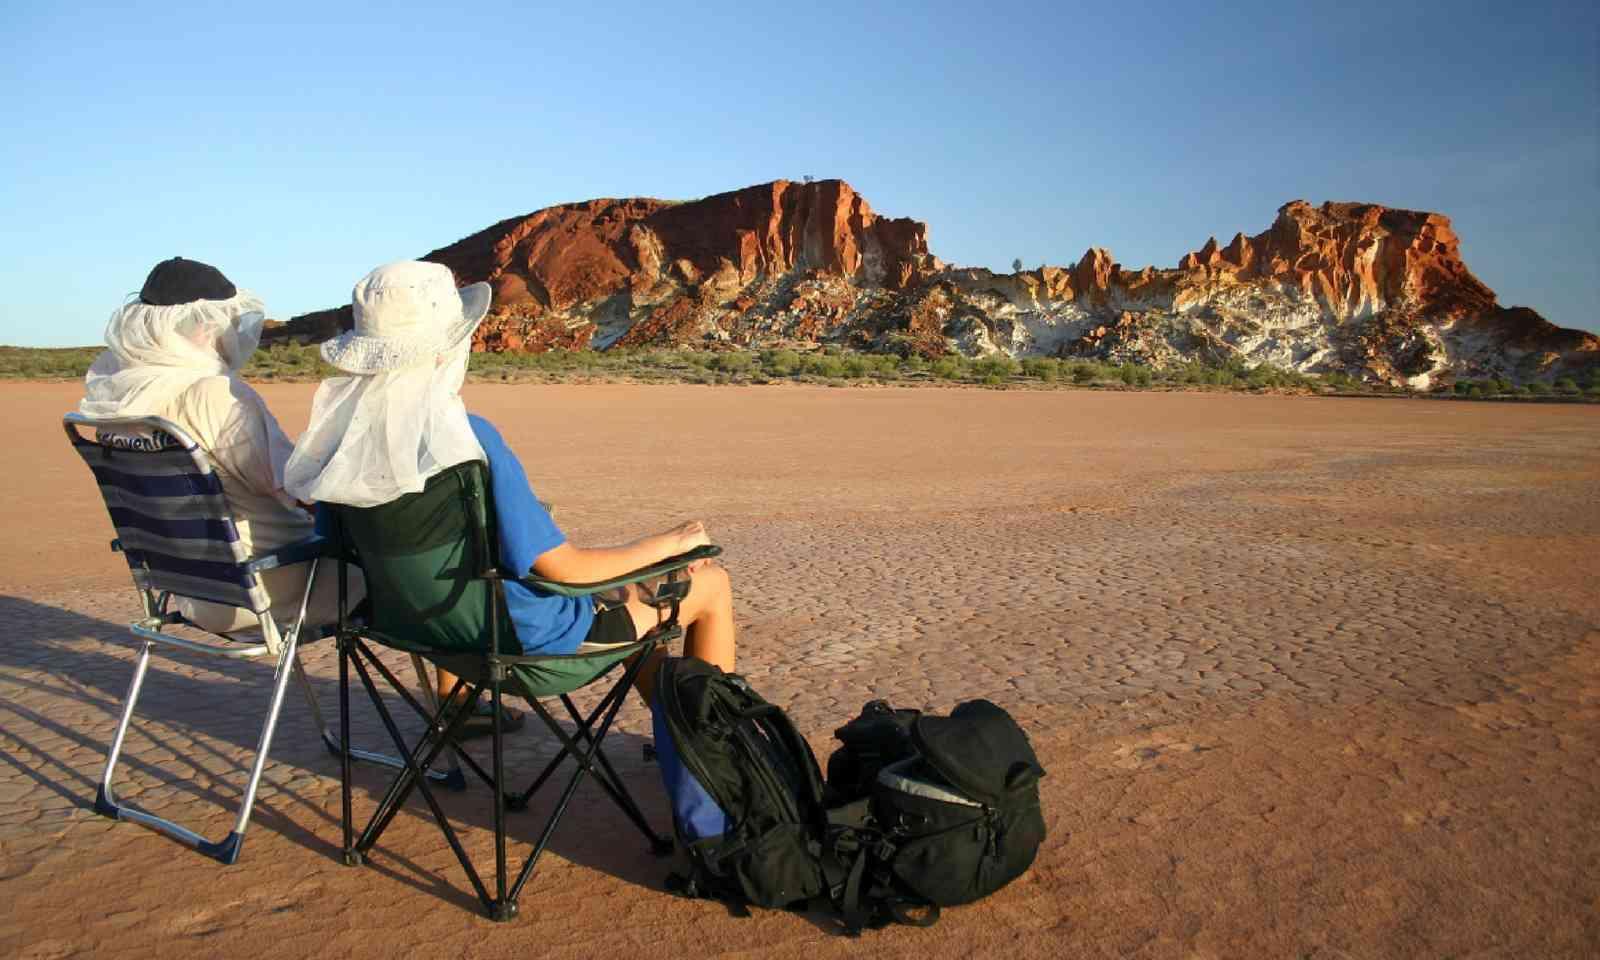 Trekkers in Rainbow valley, Northern Territory (Shutterstock)